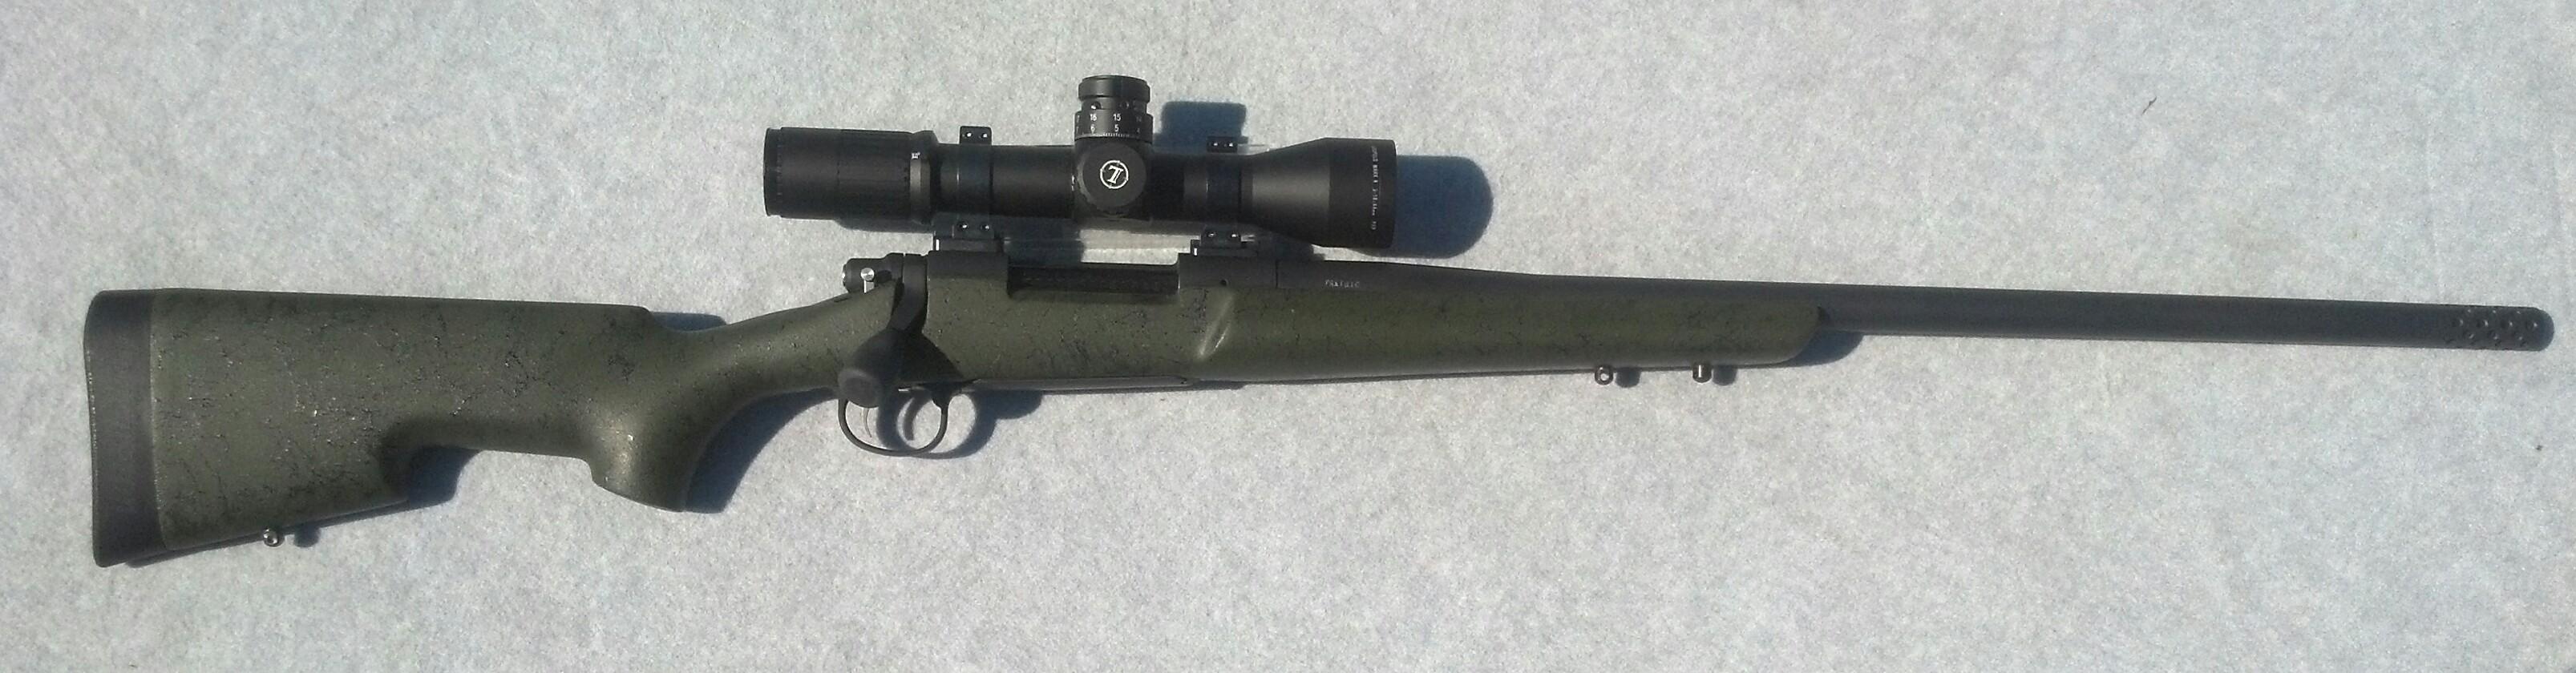 long_range_hunter_rifle